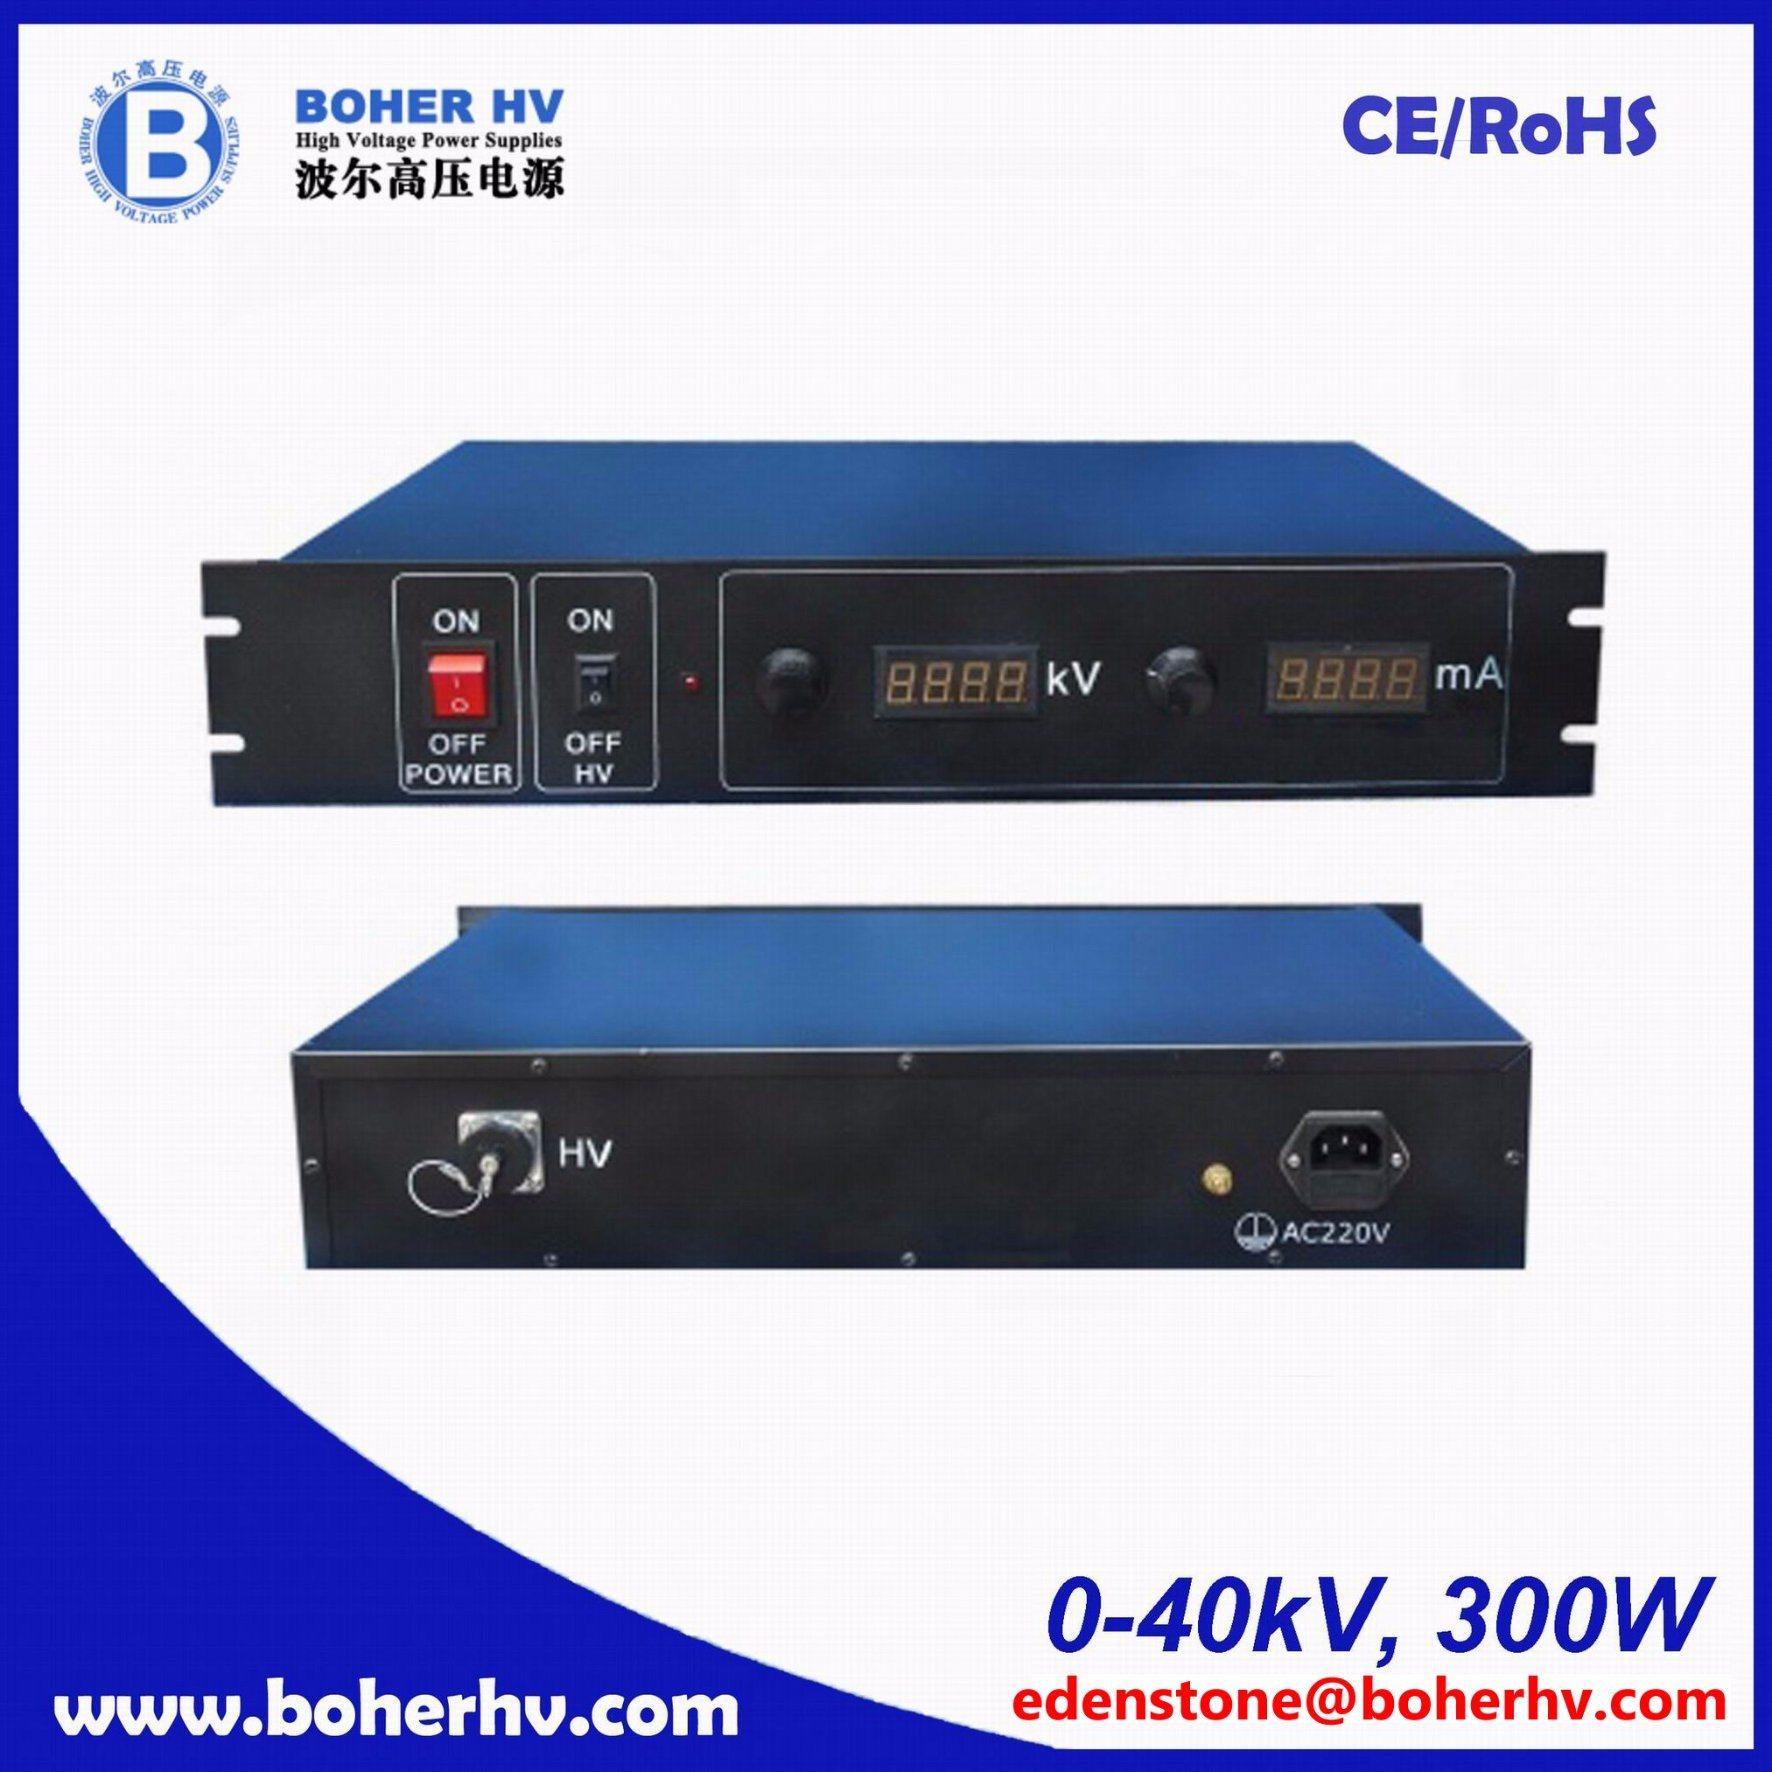 High Voltage Rack power supply 300W 40kV LAS-230VAC-P300-40K-2U